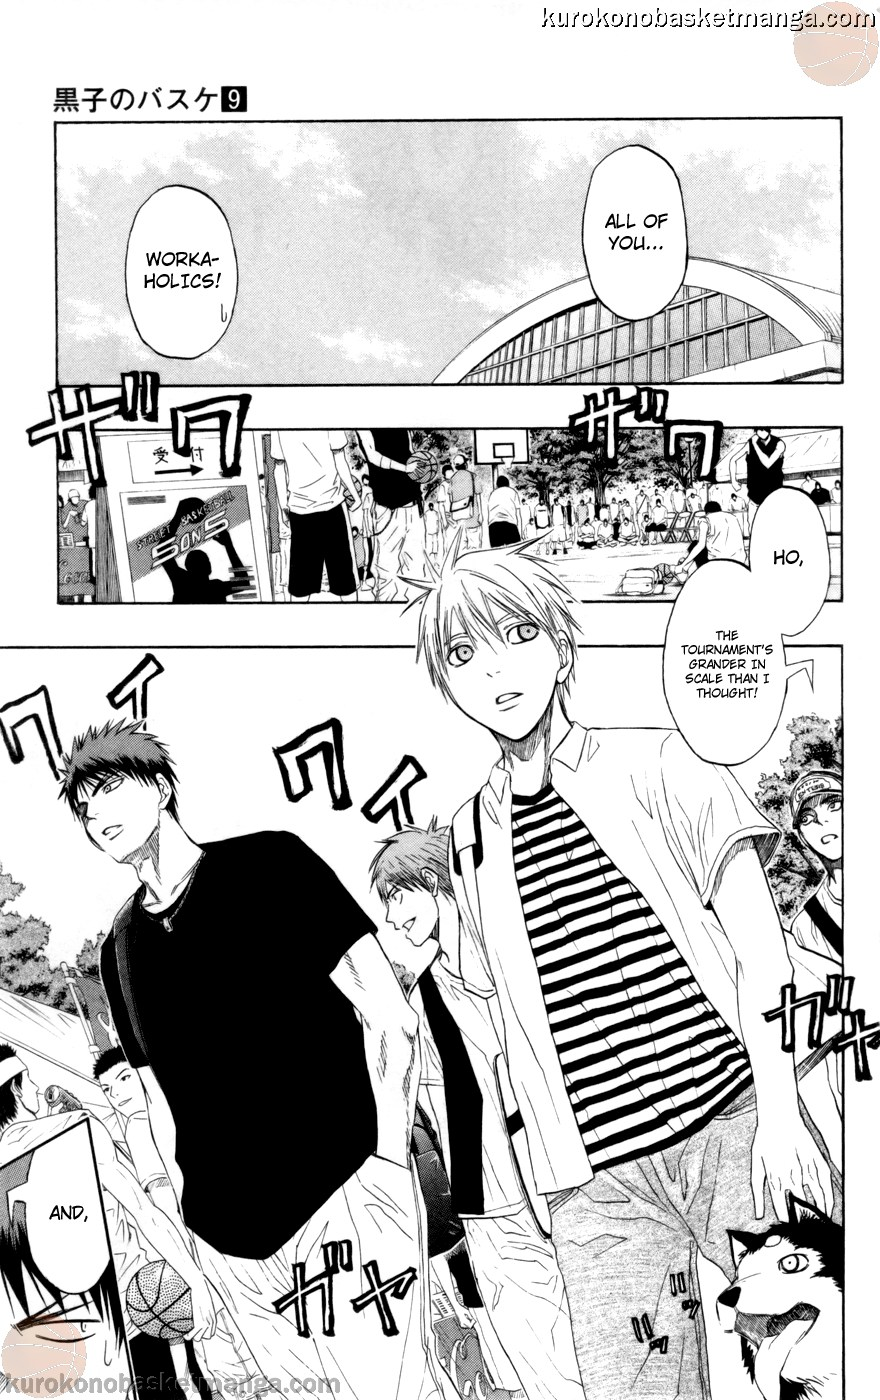 Kuroko no Basket Manga Chapter 75 - Image 05